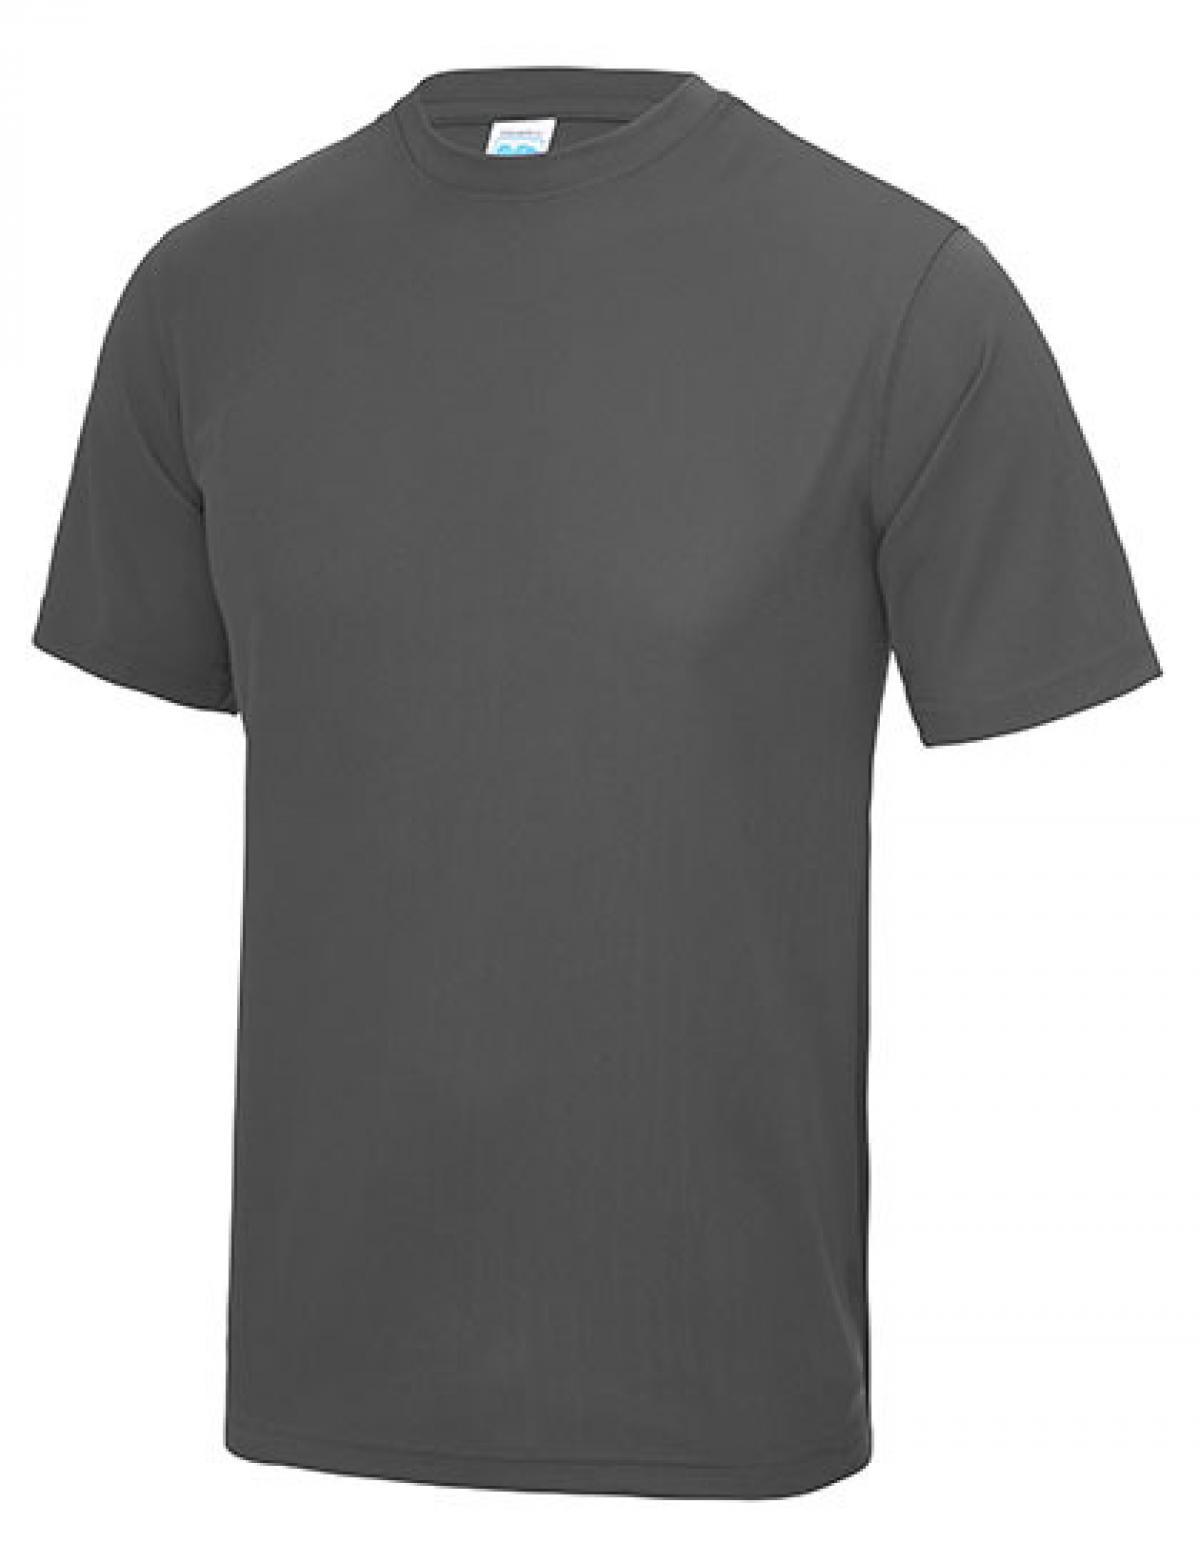 kids cool t shirt kinder sportshirt uv sonnenschutz 30 rexlander s. Black Bedroom Furniture Sets. Home Design Ideas